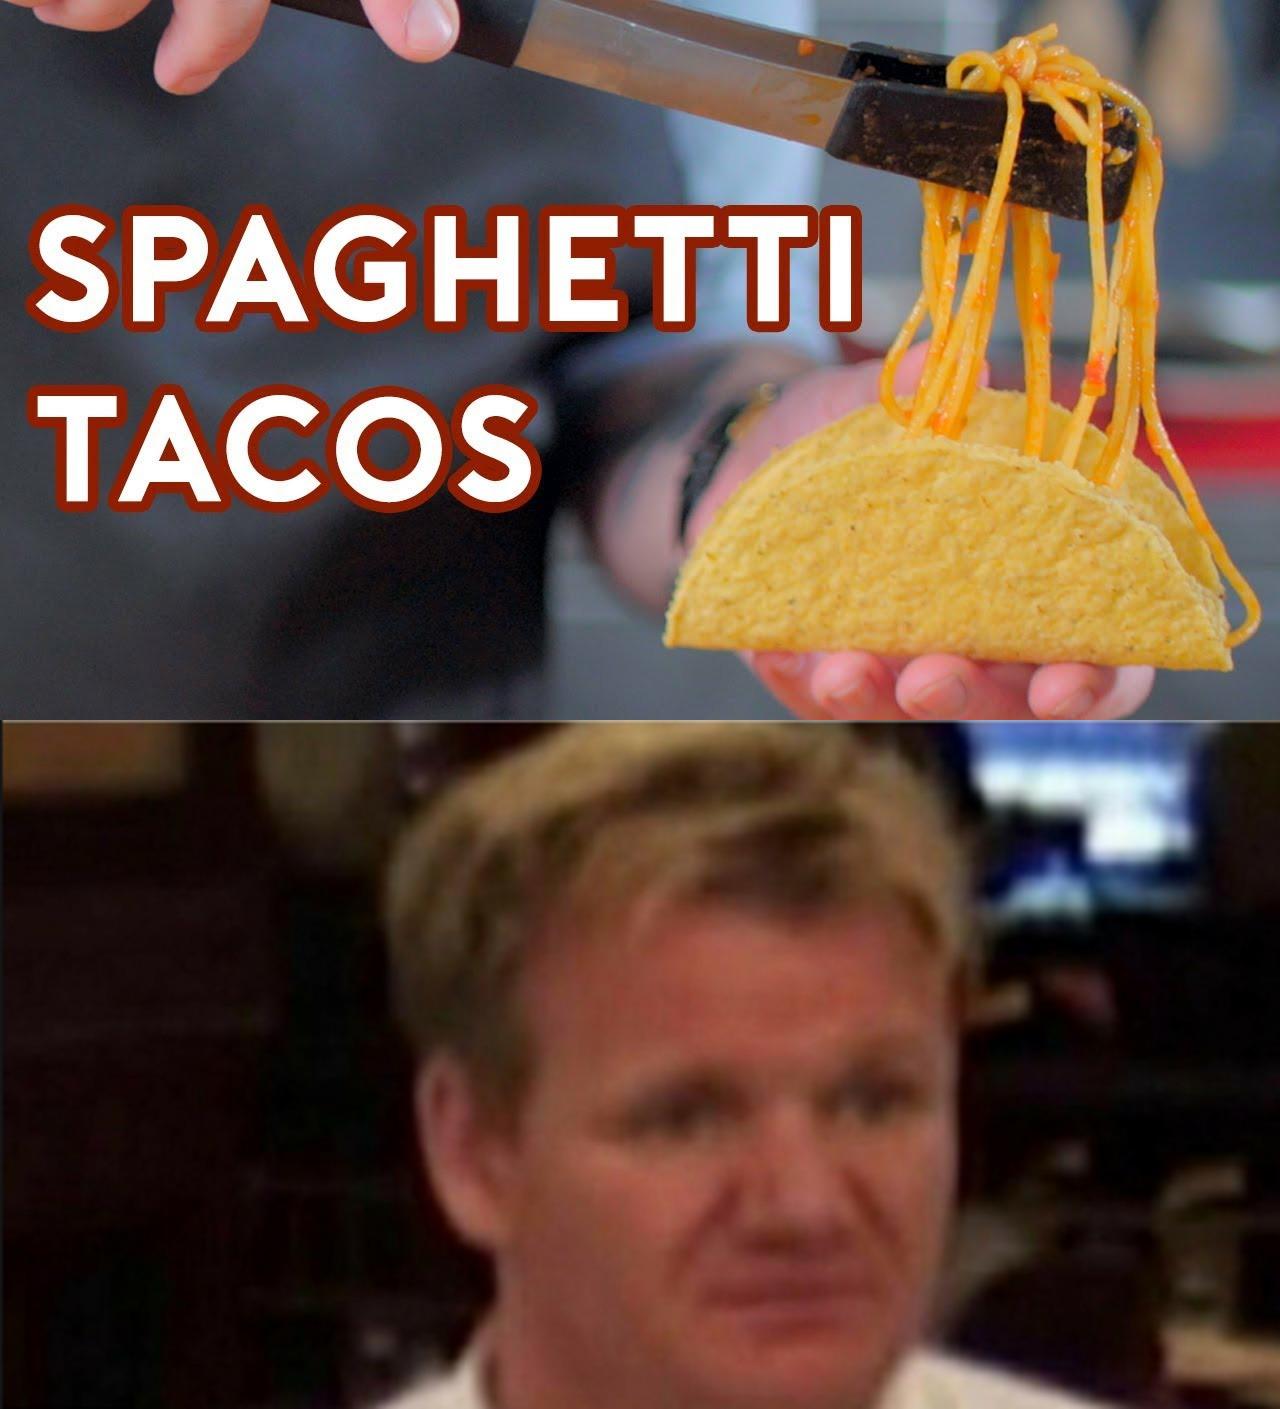 Spaghetti Tacos Meme Subido Por Tehe Memedroid